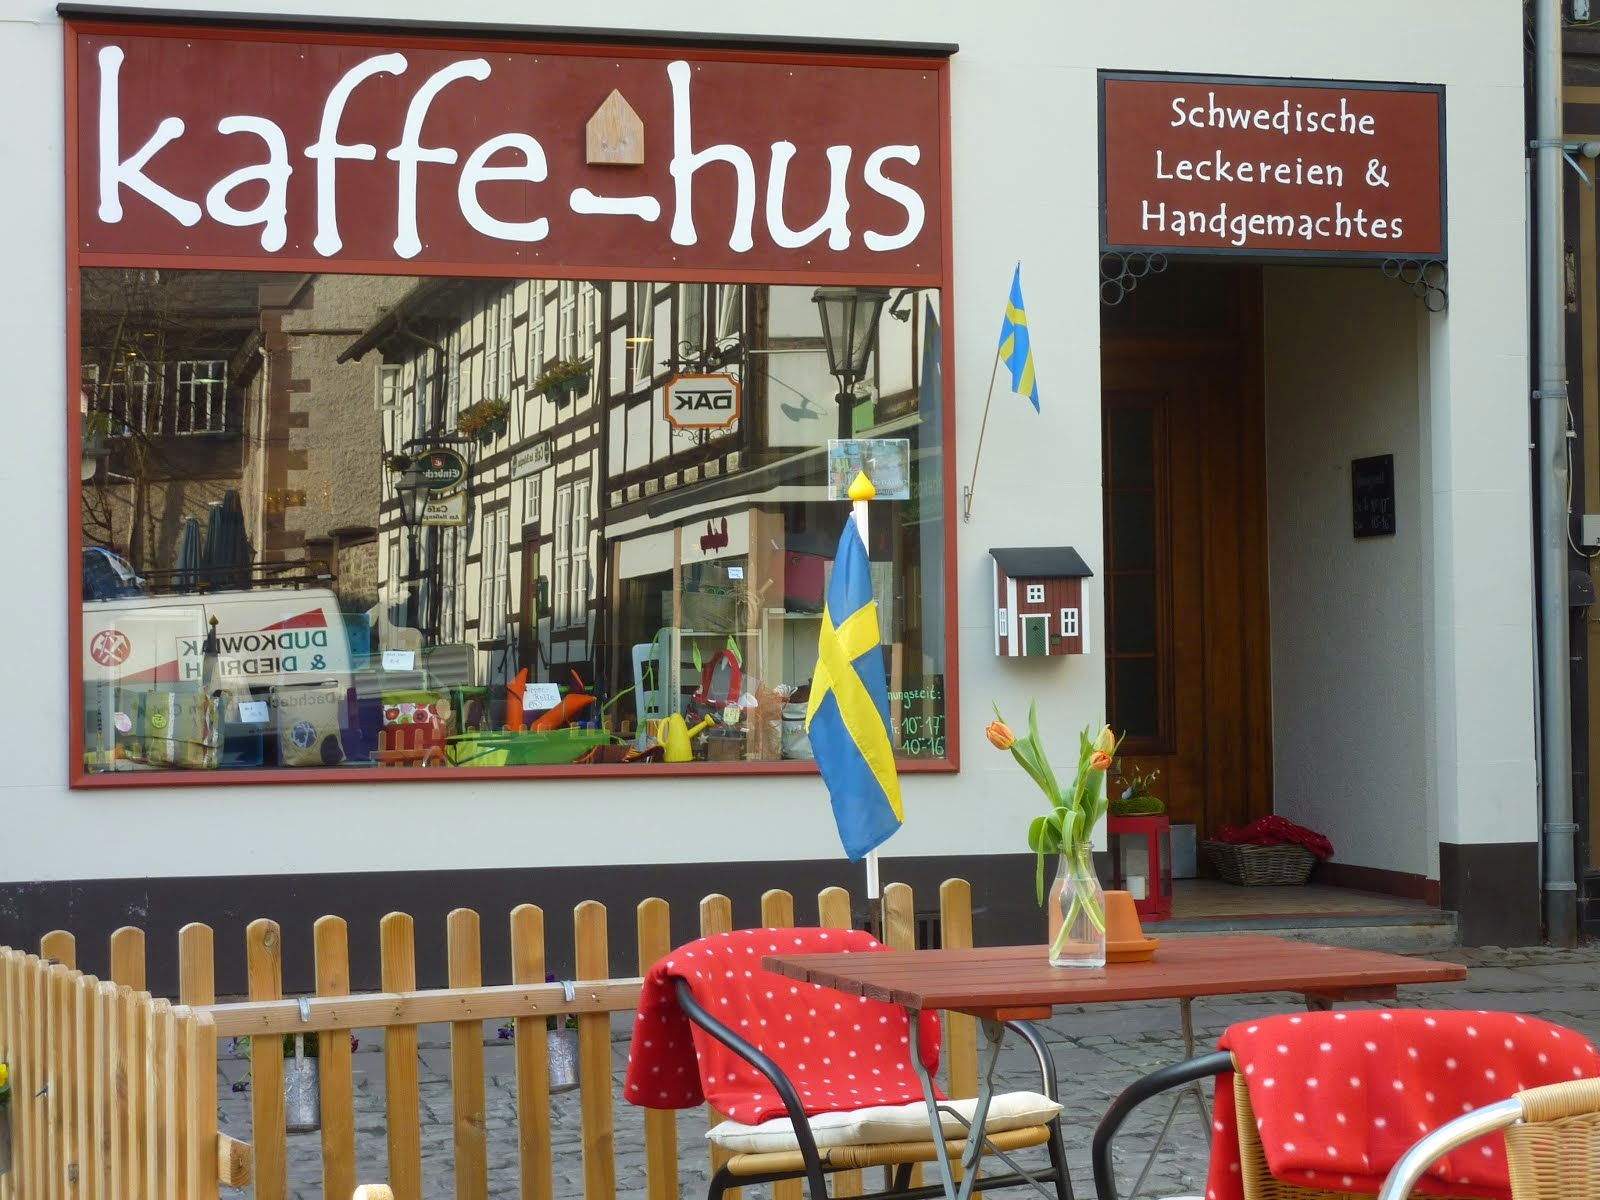 kaffe-hus Einbeck